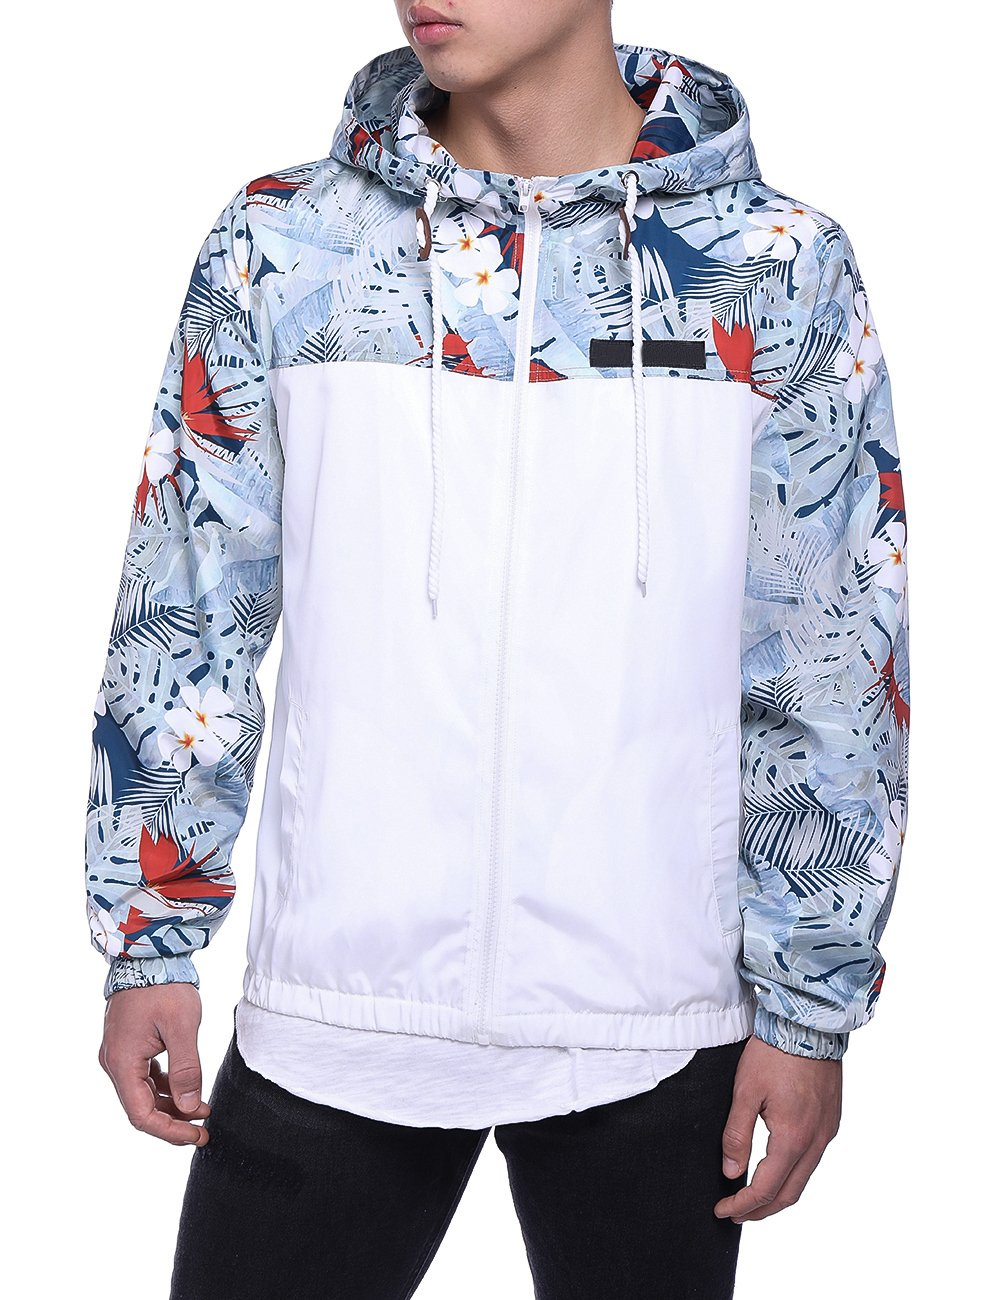 HEQU Men's Floral Hooded Windbreaker Lightweight Zip-up Jacket with Pocket White 2XL